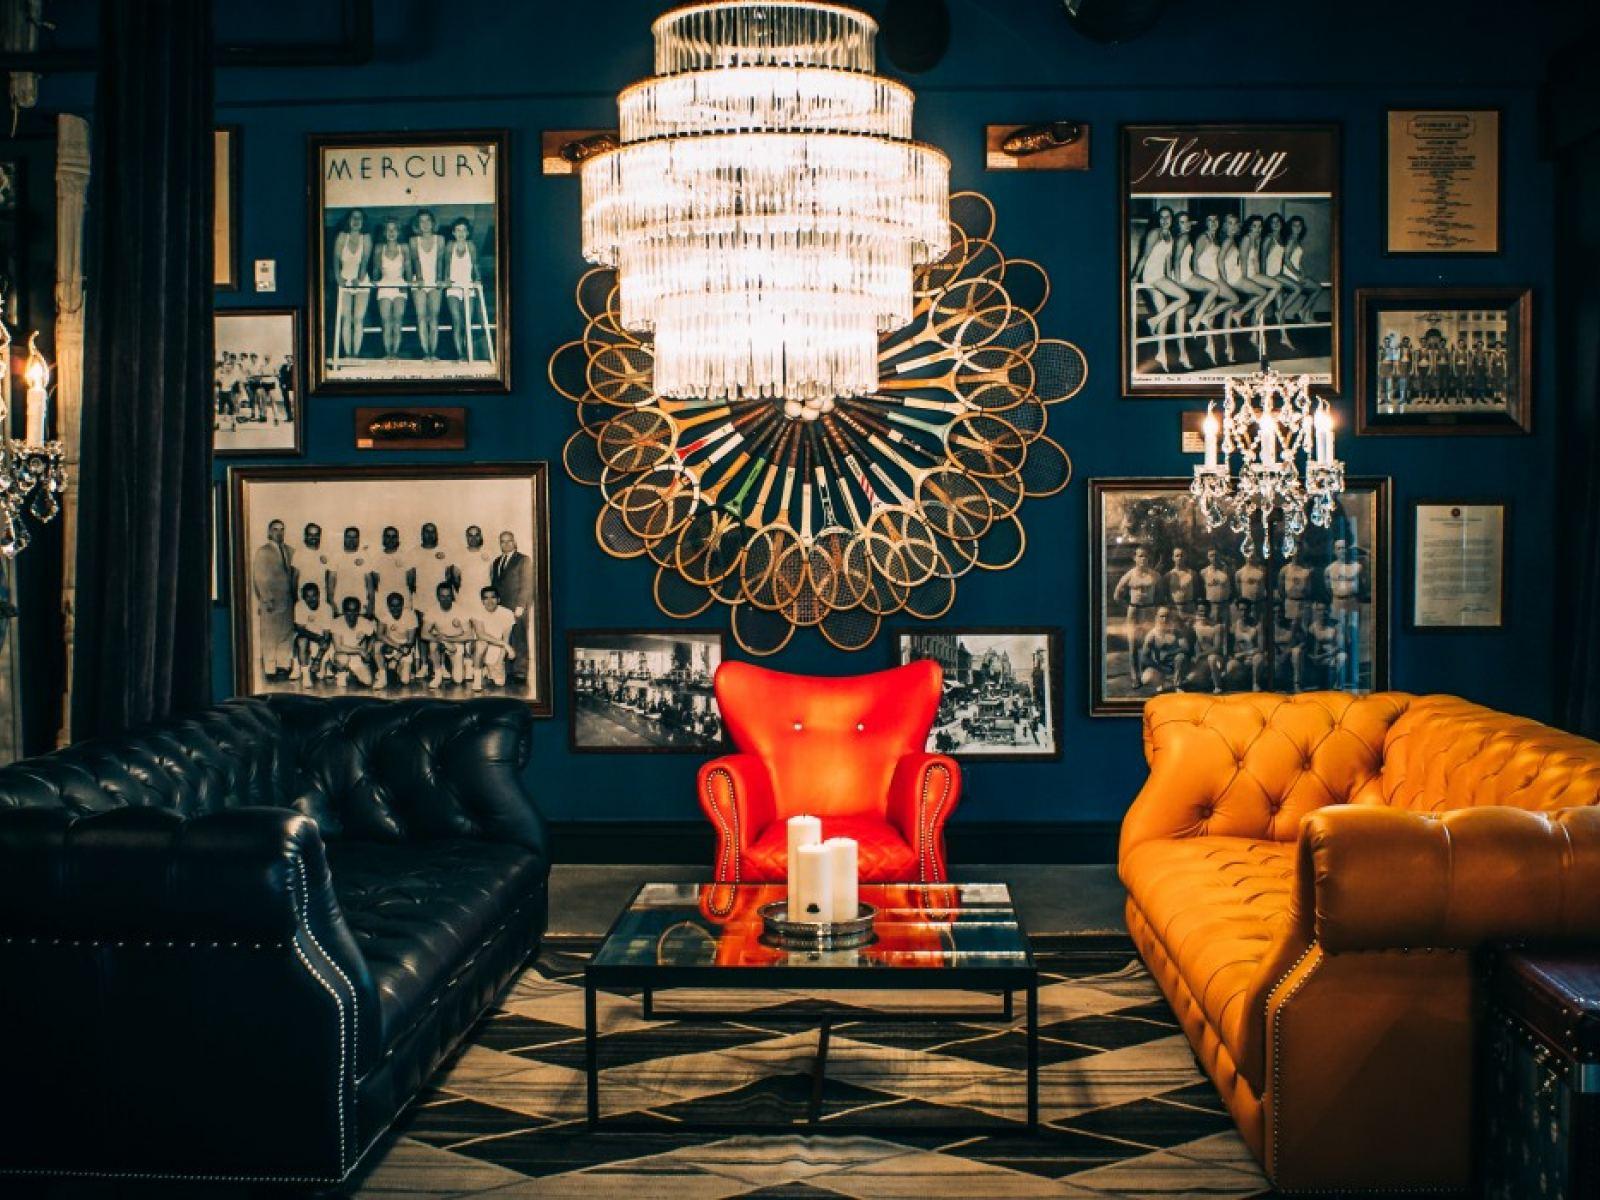 Blue Room at Los Angeles Athletic Club